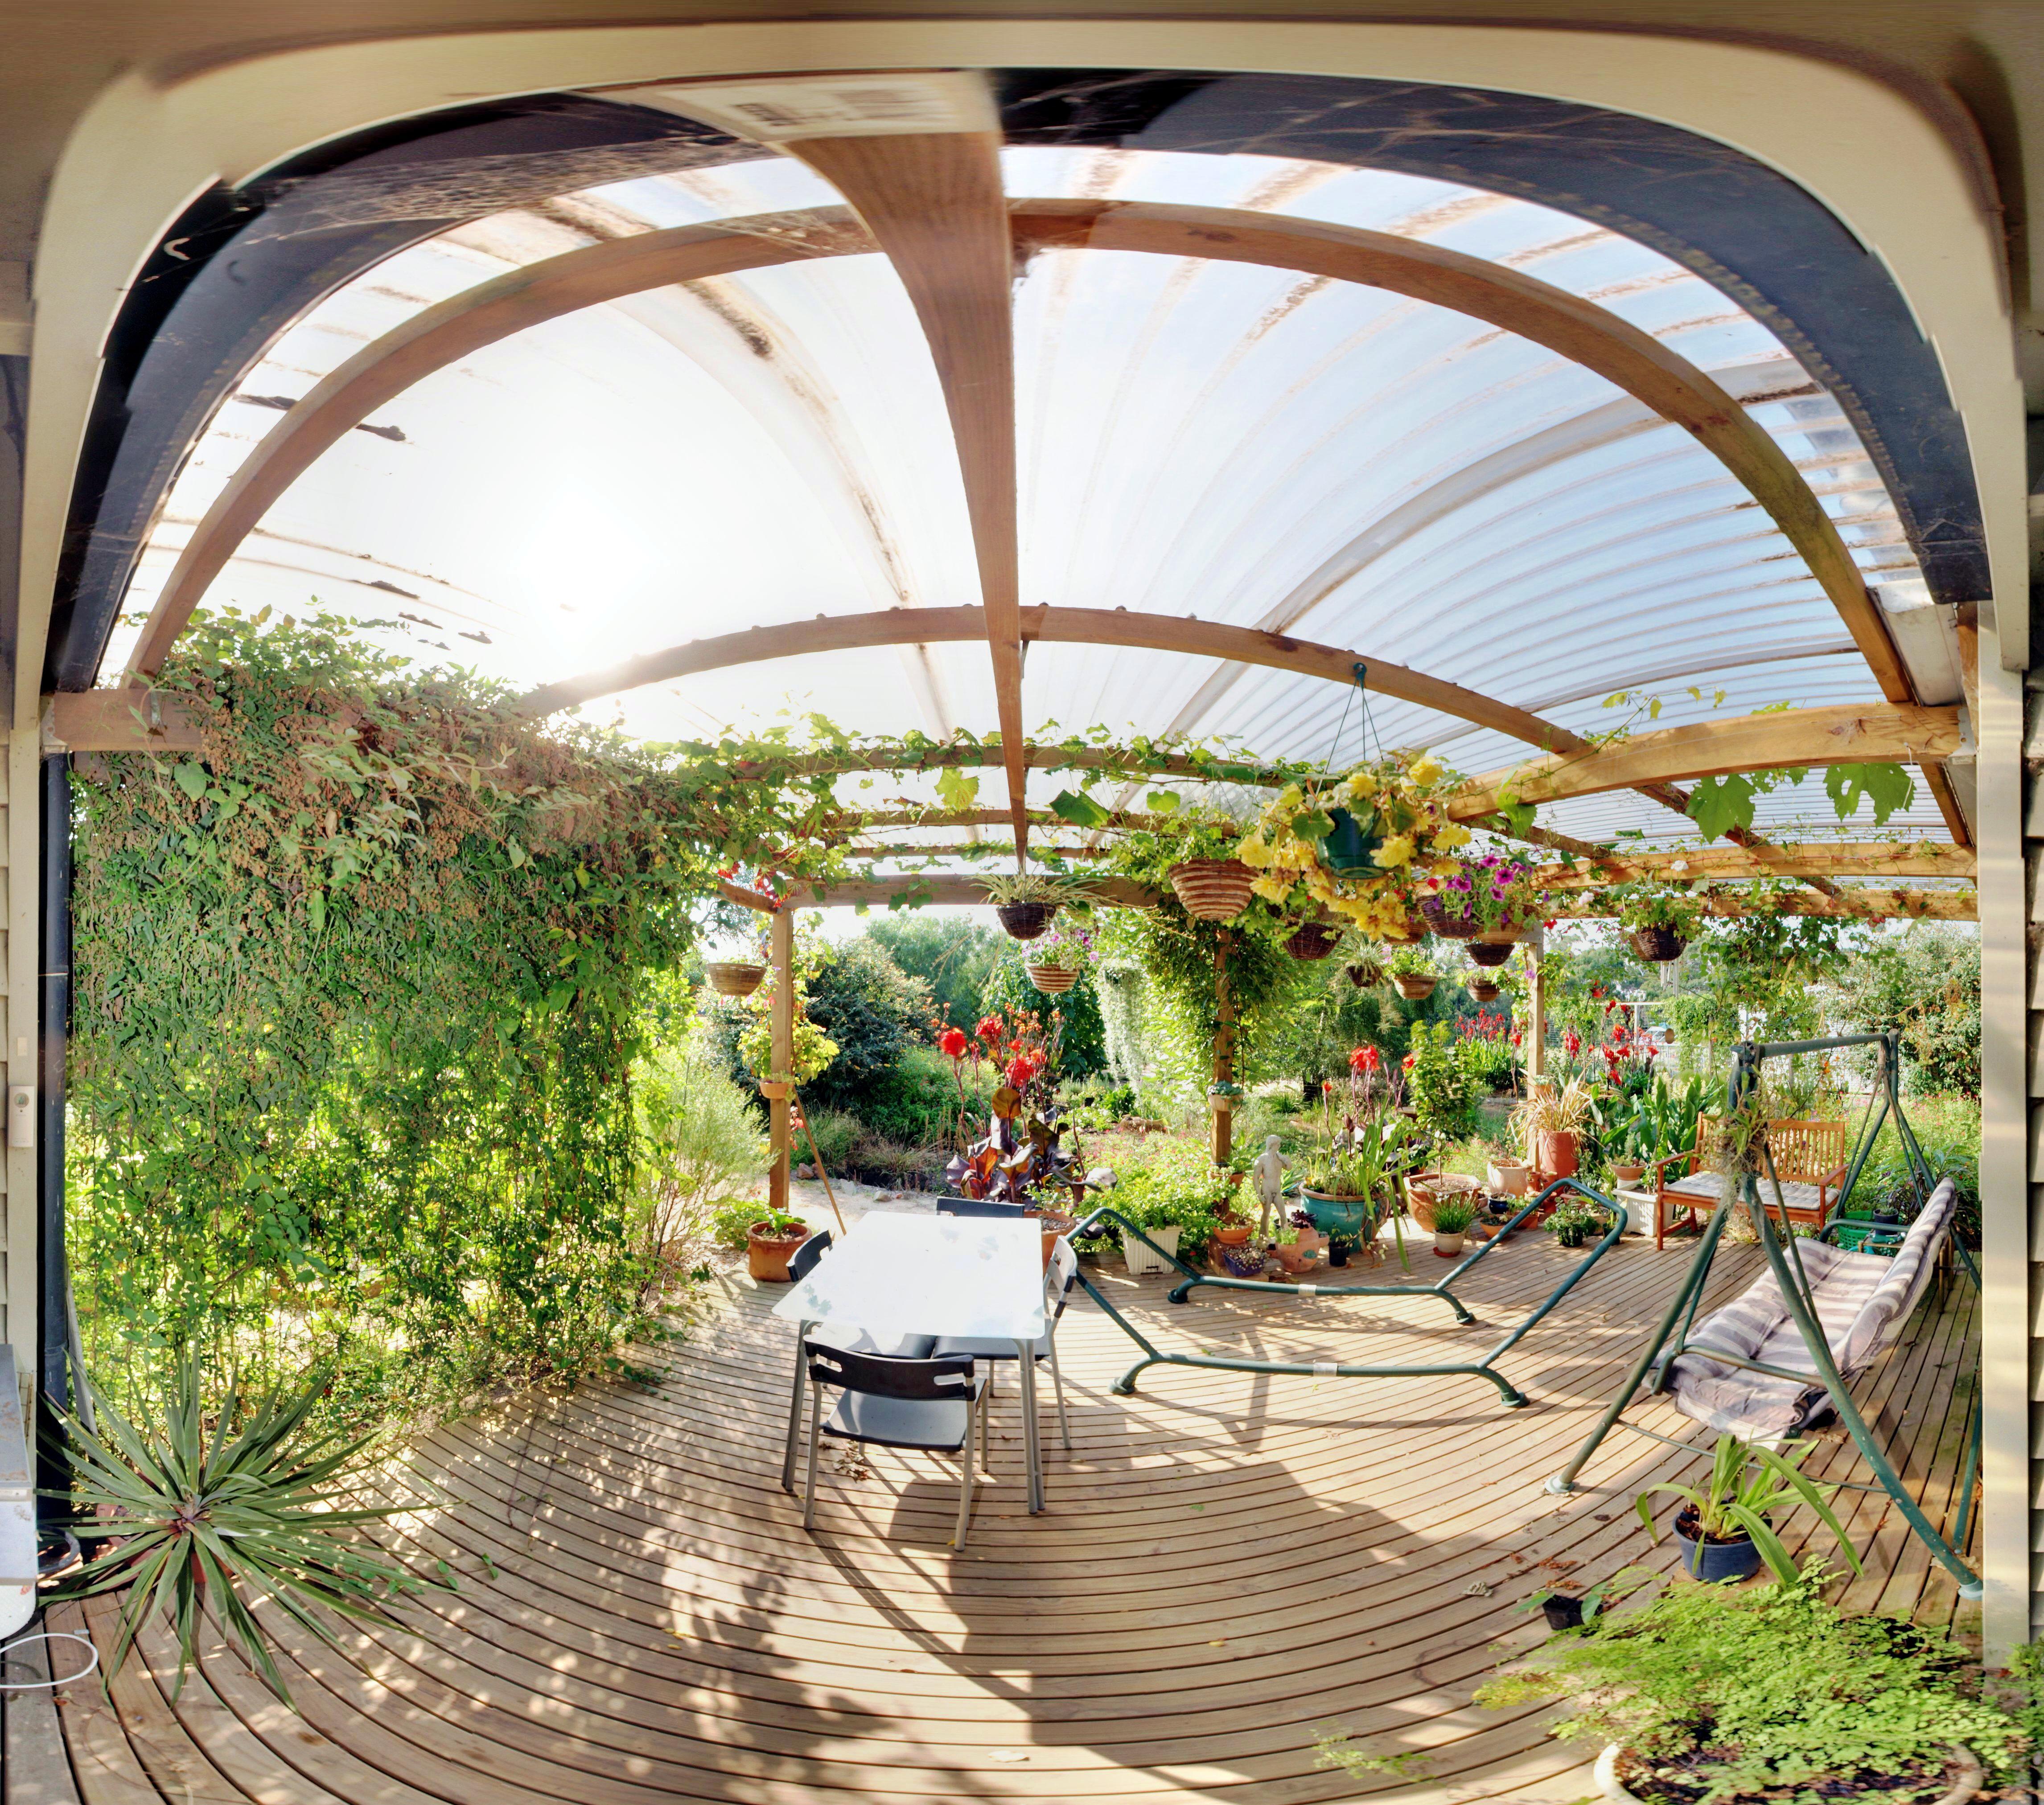 This should be verandah-panorama.jpeg.  Is it missing?